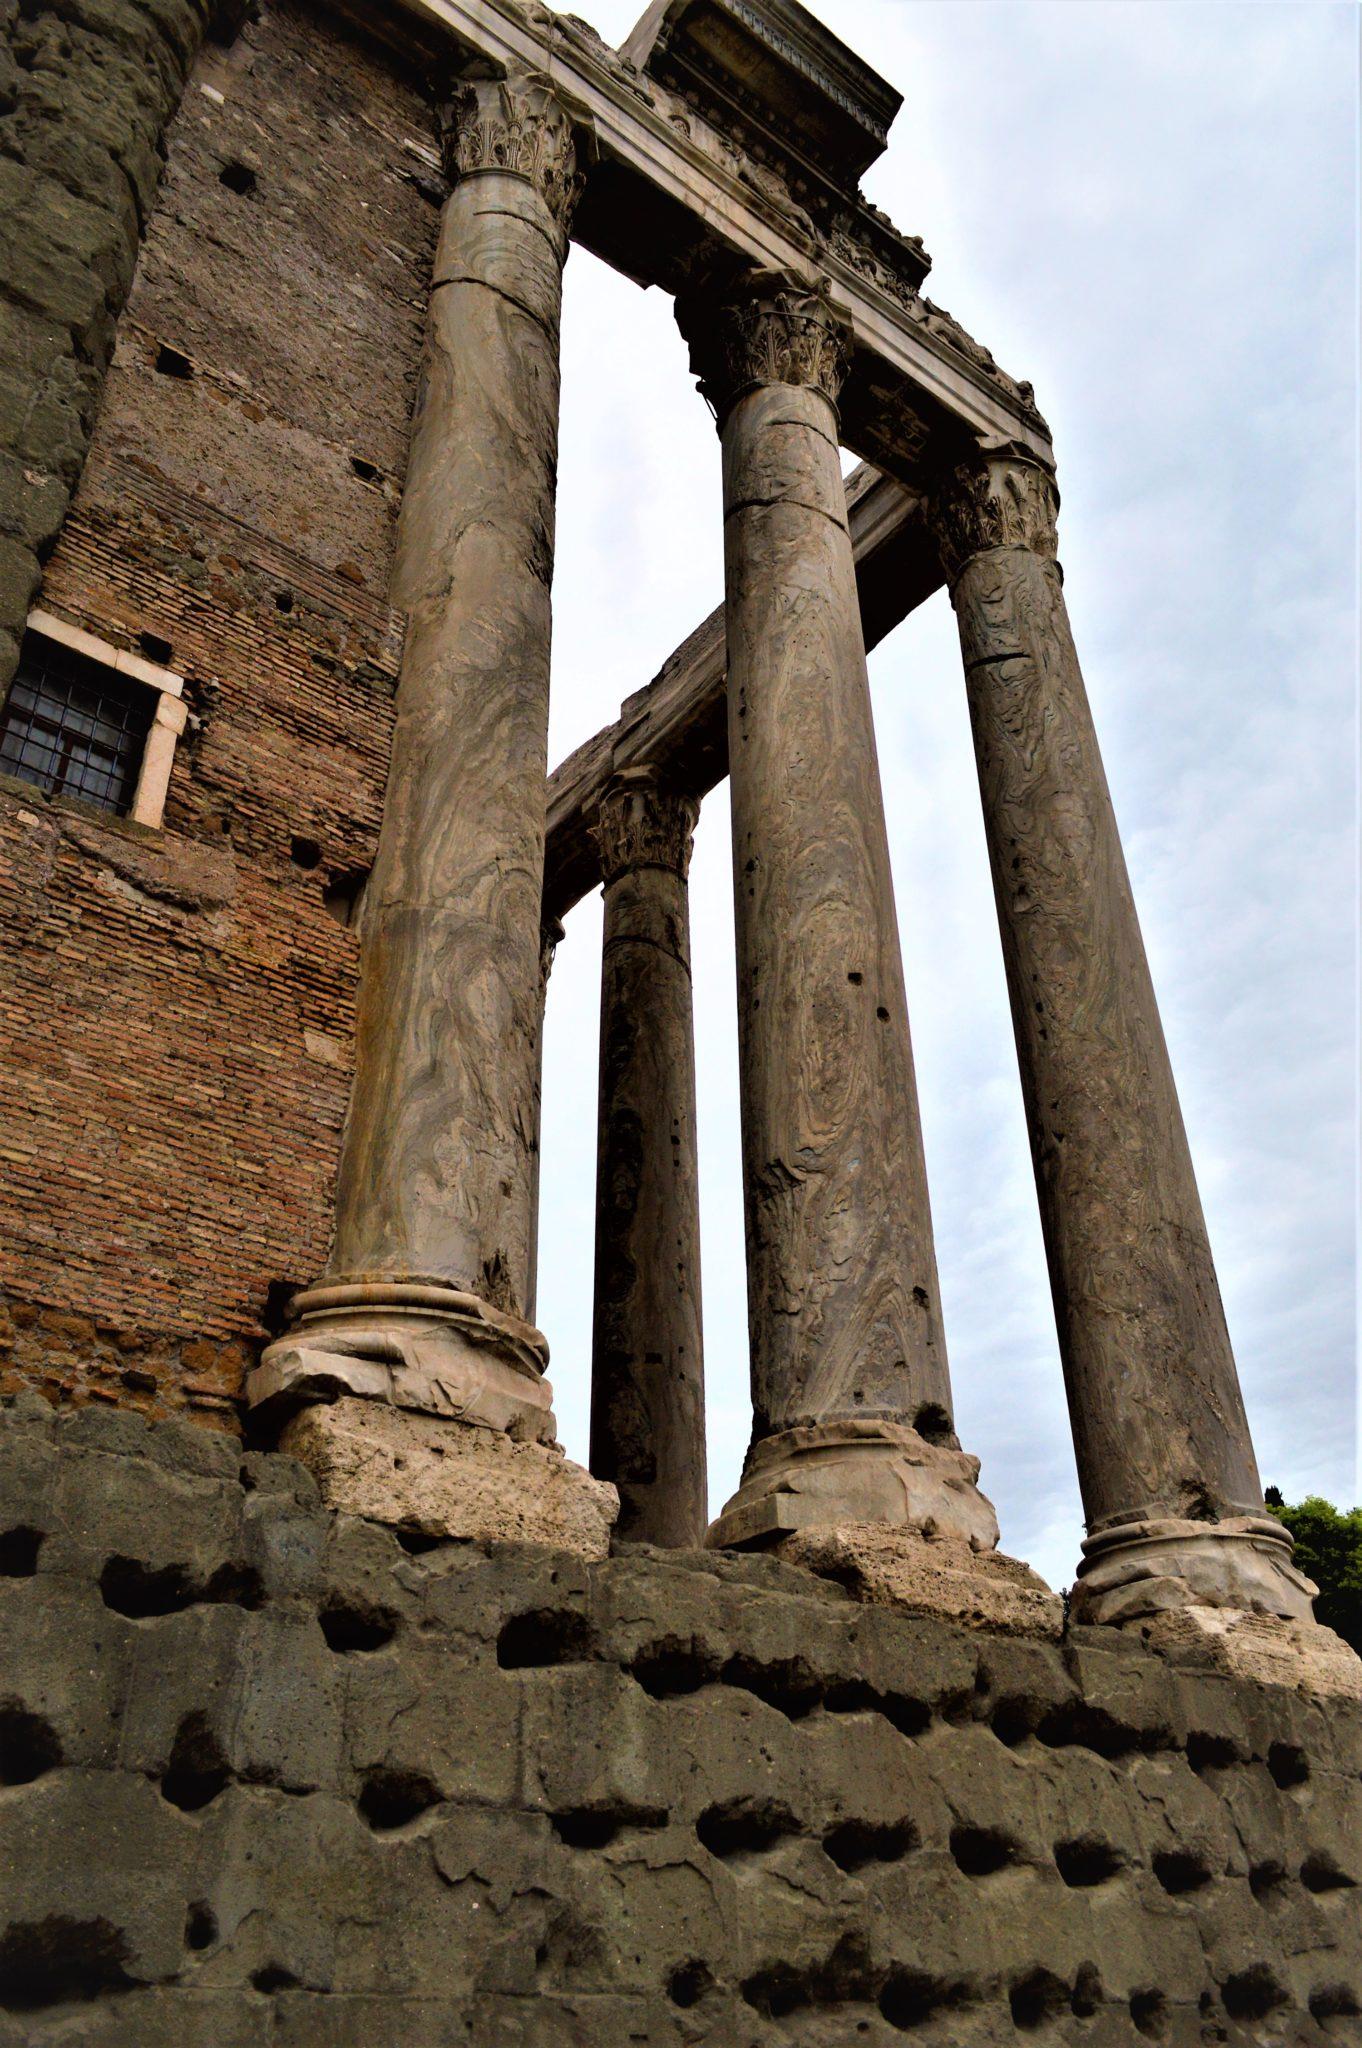 Columns in Roman Forum, Rome, Italy